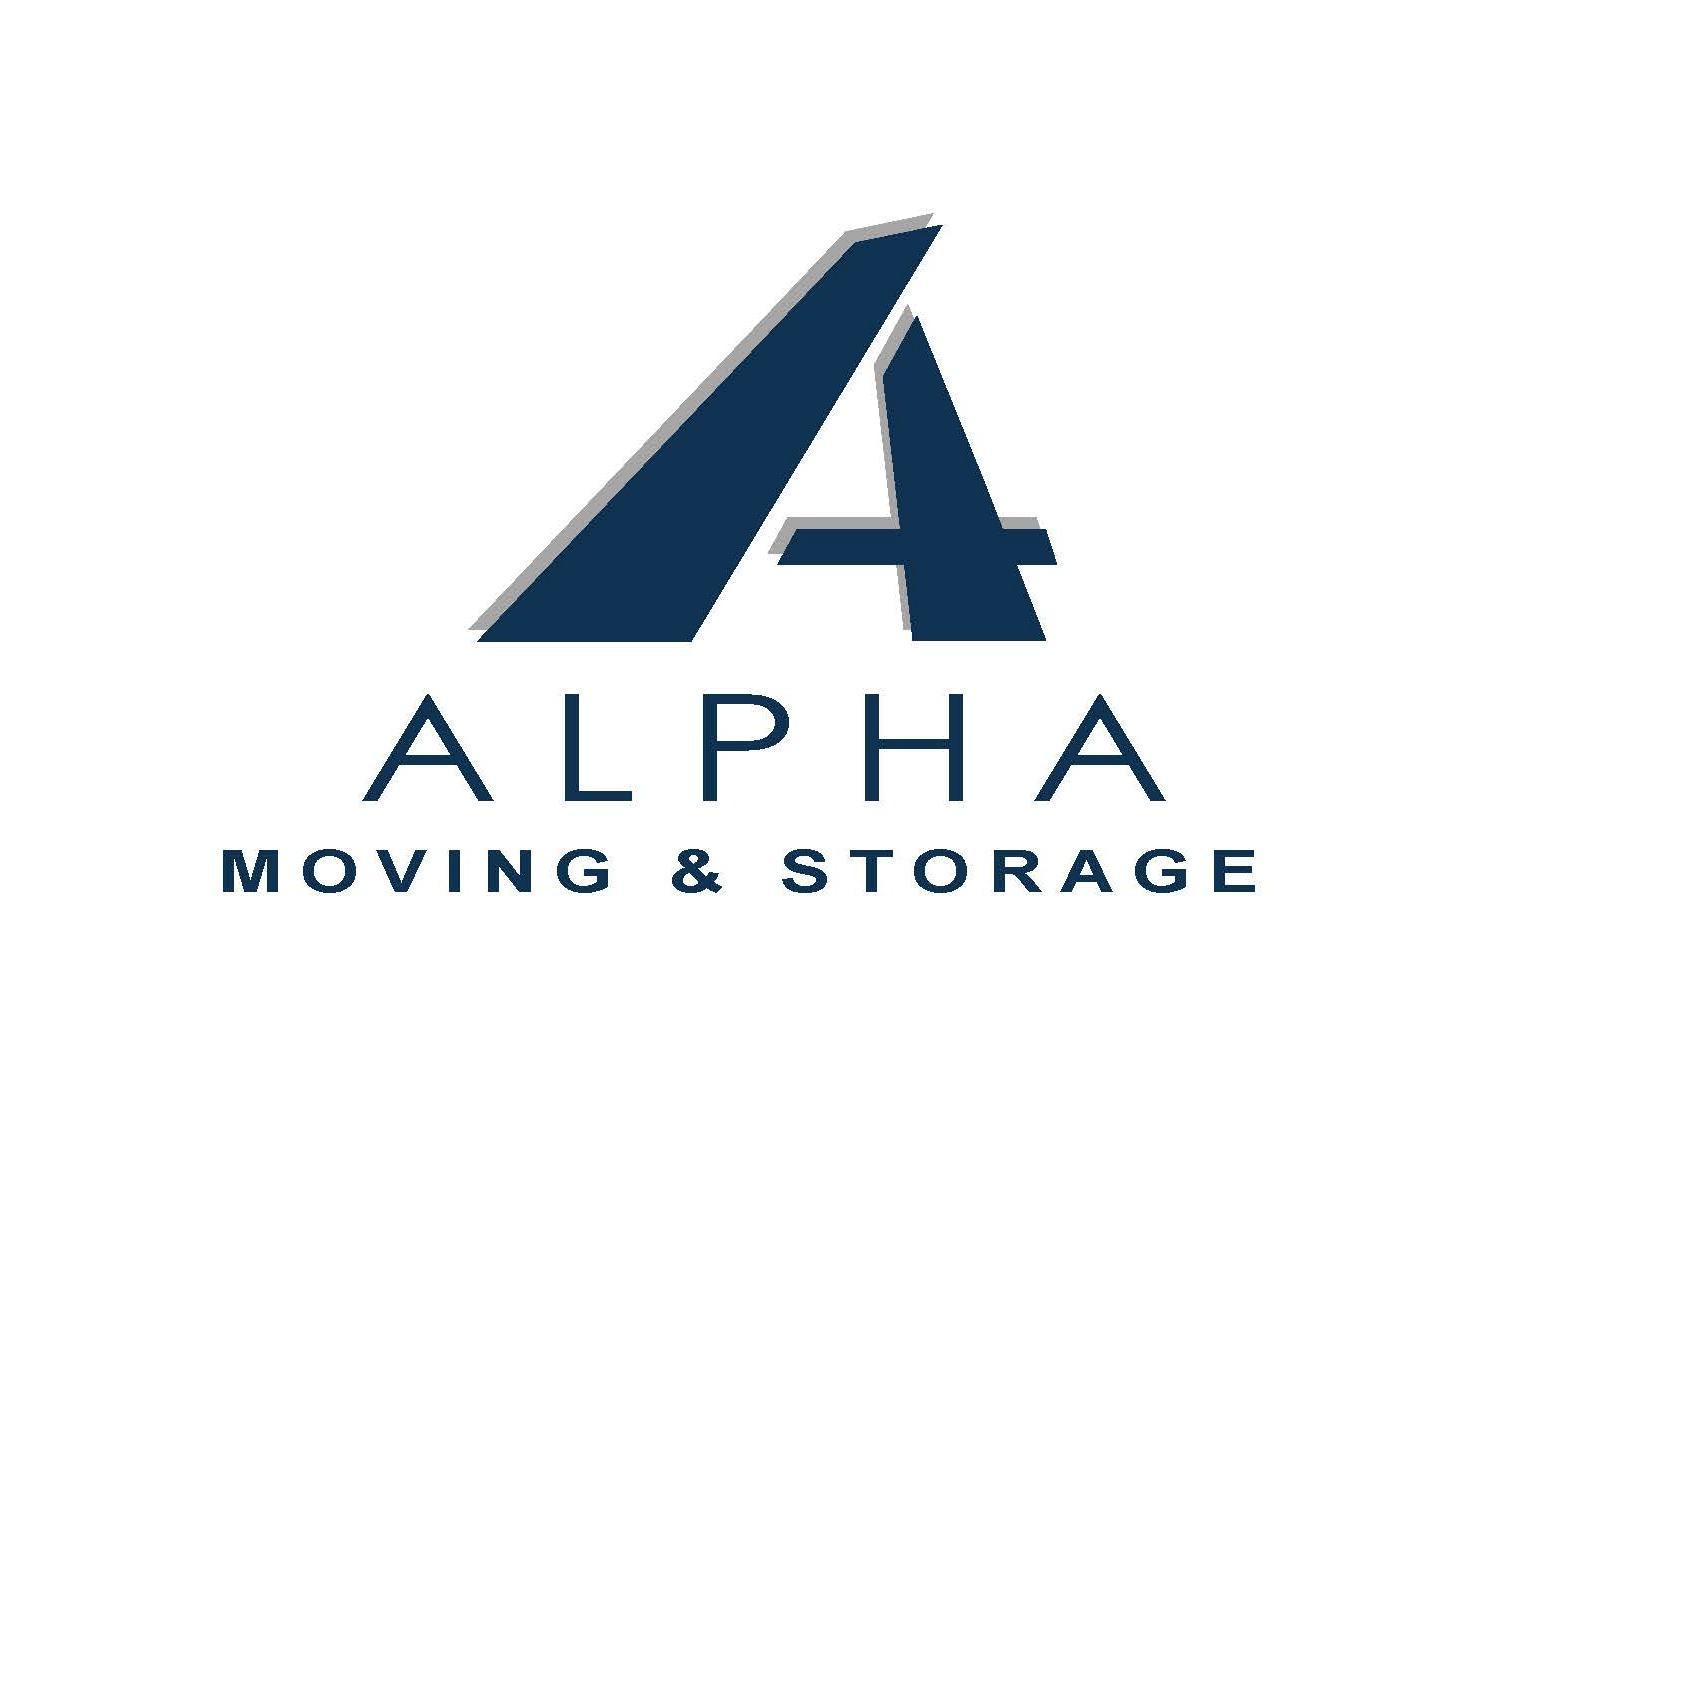 Alpha Moving & Storage image 1